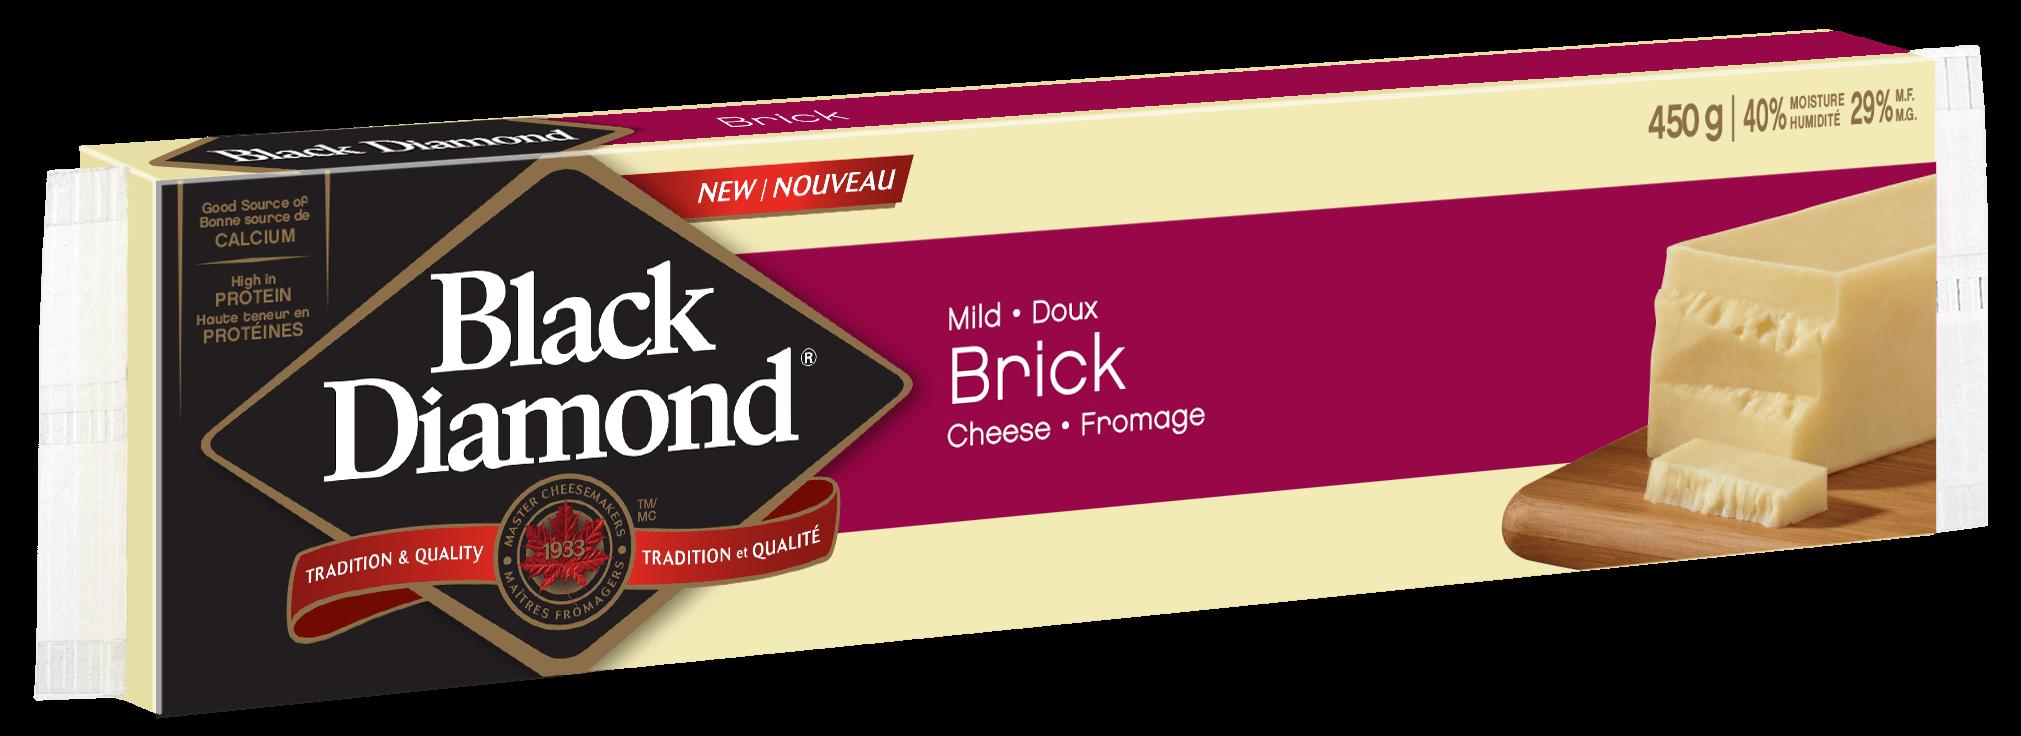 BD_450g_Brick